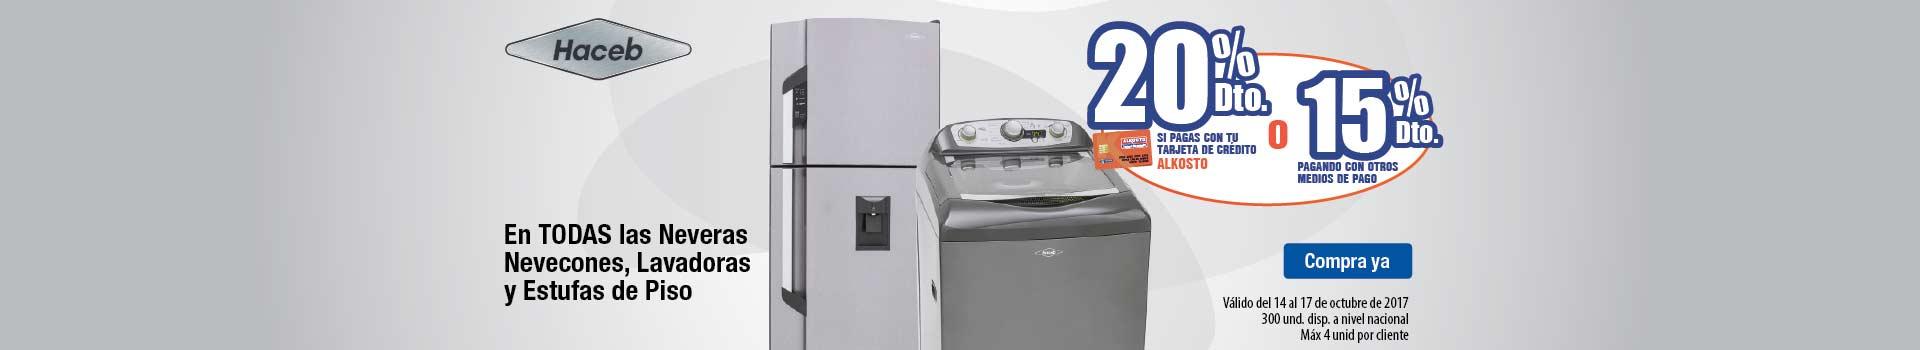 CAT ELECT AKyKT-1-LB-TODOrefrigeracion-lavadoras-estufasHACEB-cat-oct14-17